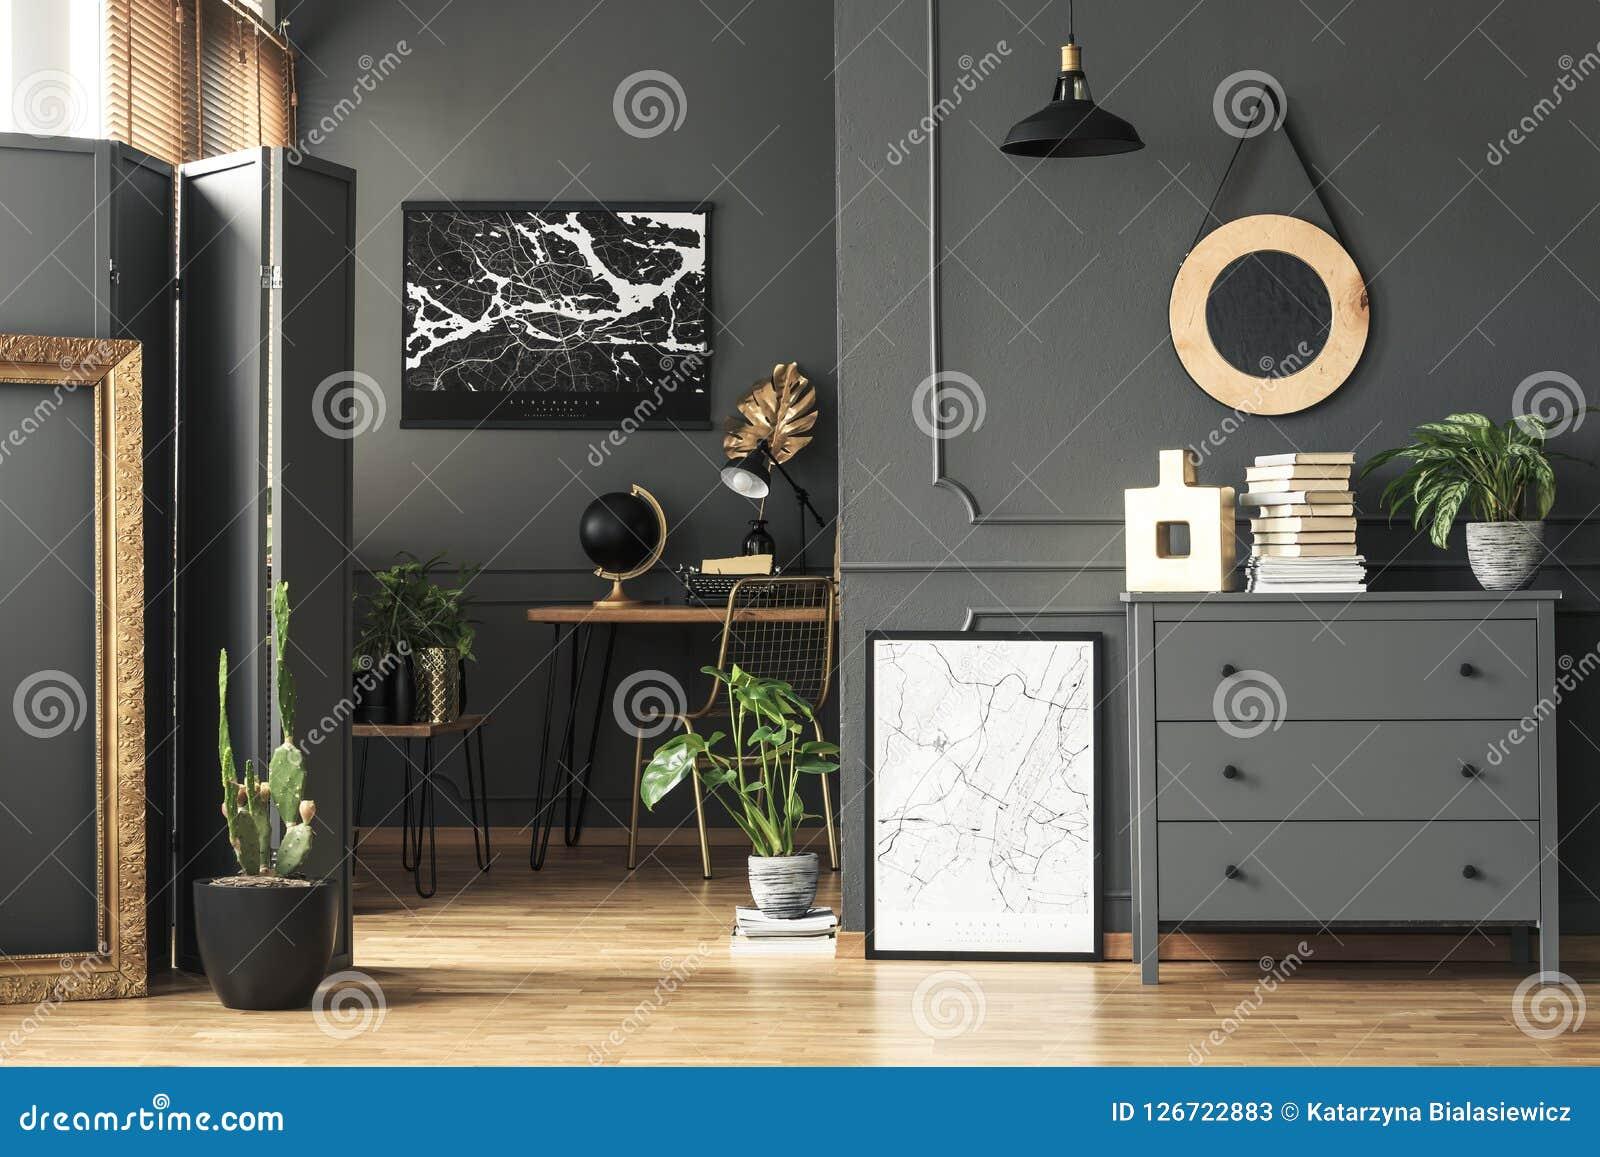 Mapa preto na parede cinzenta no interior escuro da sala de visitas com plantas